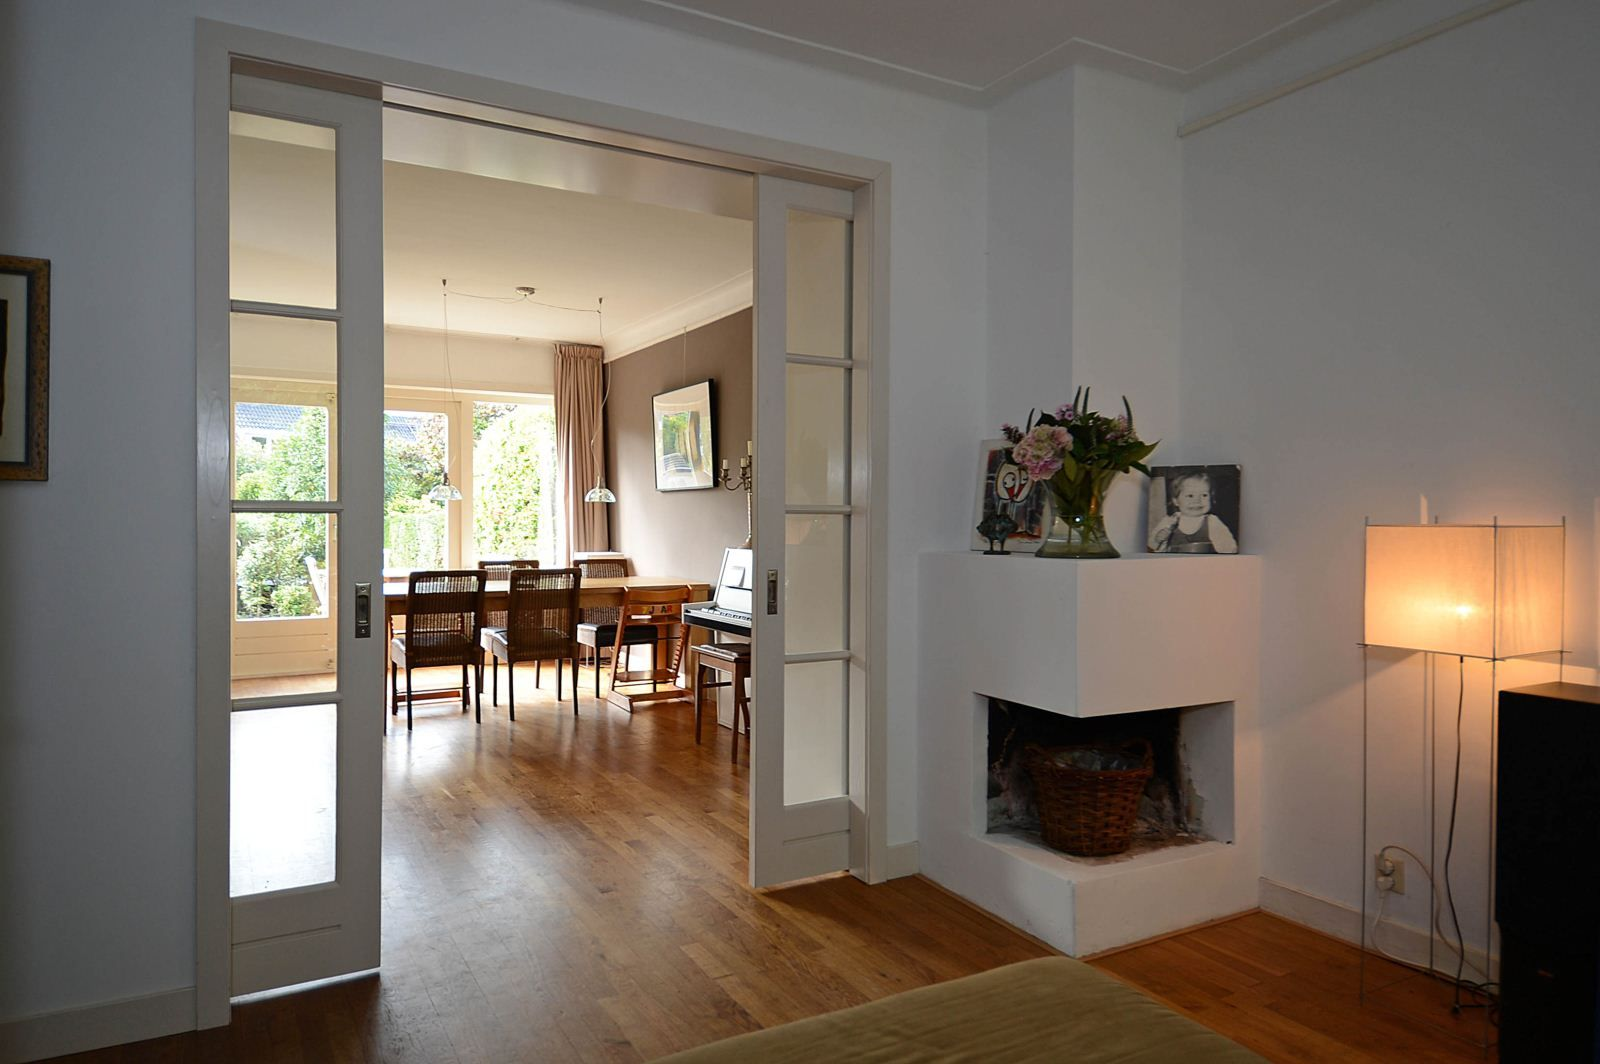 Slaapkamer Met Openhaard : Kamer ensuite open haard leuke ideeen living room house en home